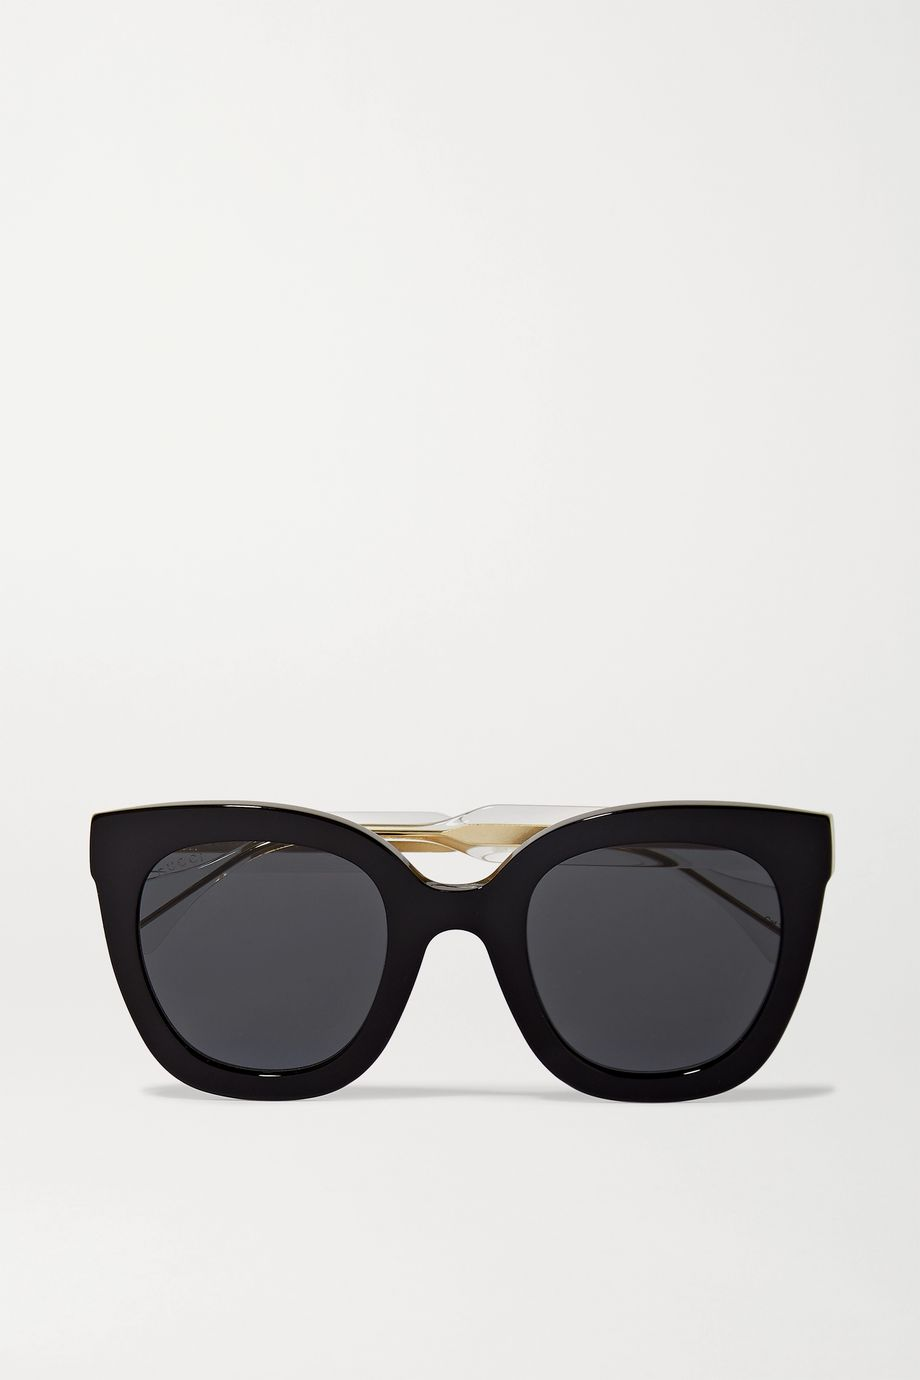 Gucci Anima Décor 超大款板材猫眼太阳镜